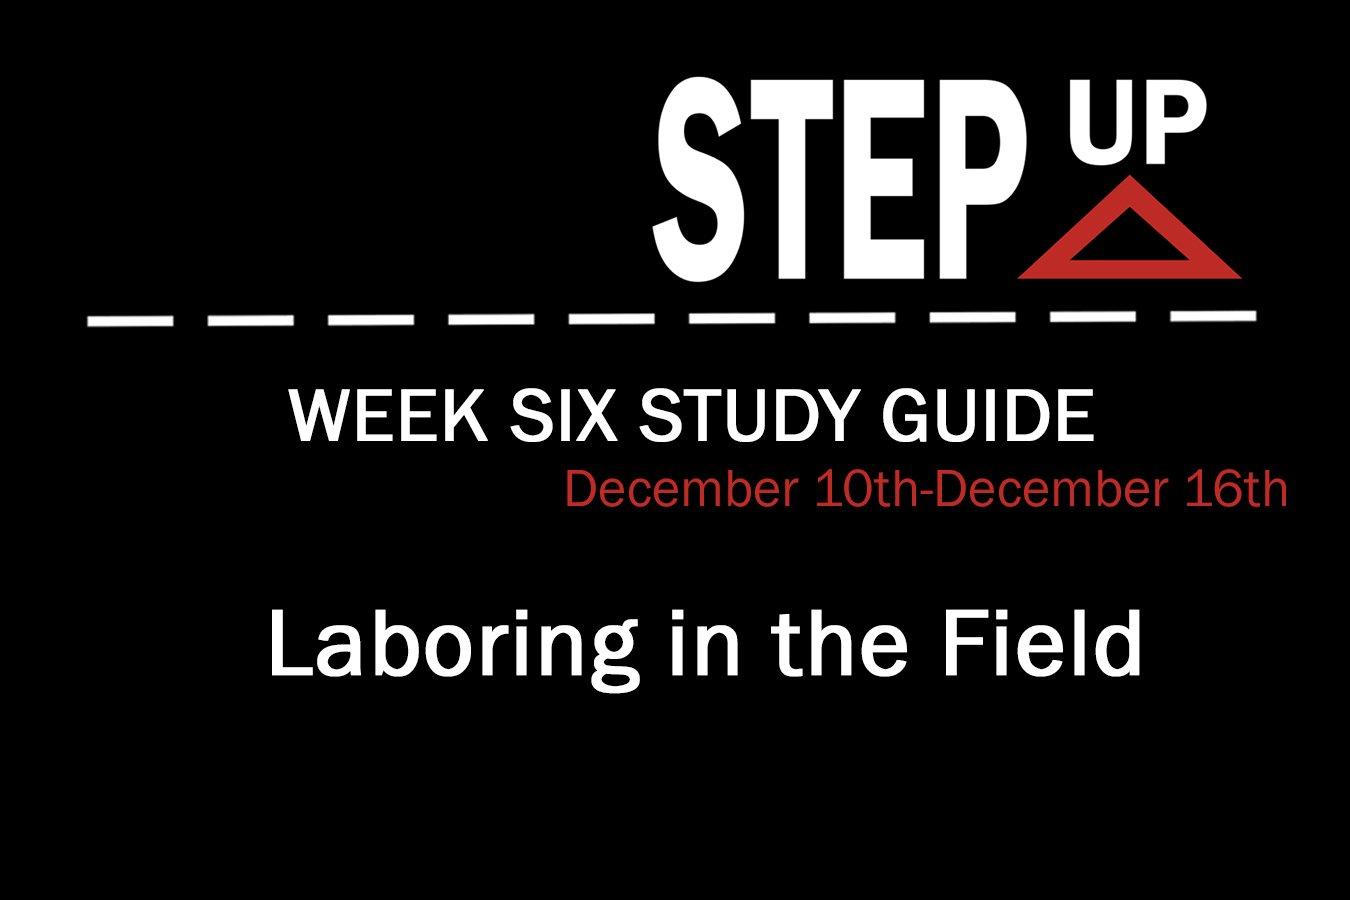 Step Up: Week Six Study Guide